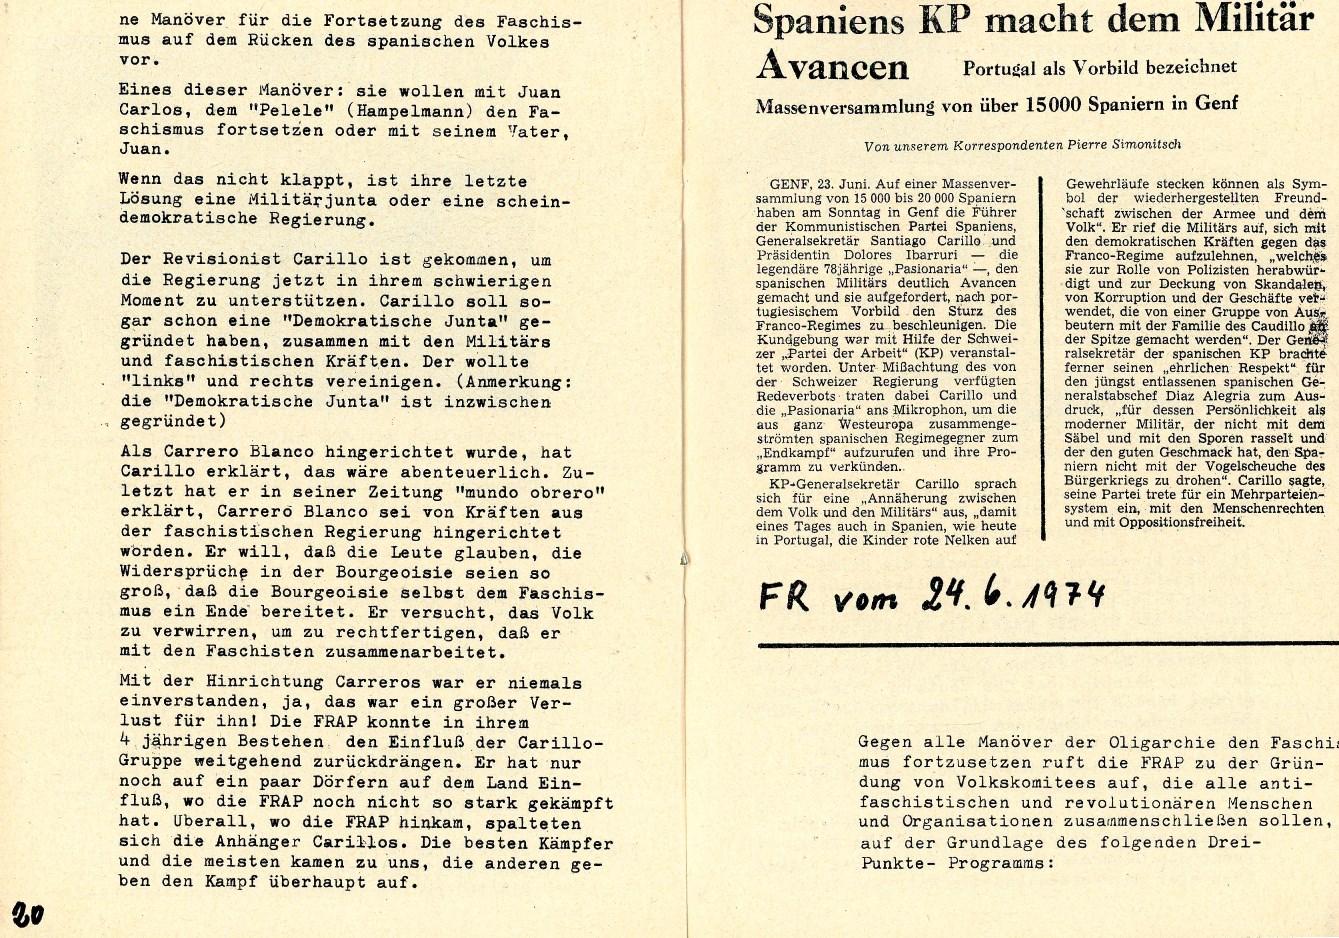 RHD_1974_Spanien_11